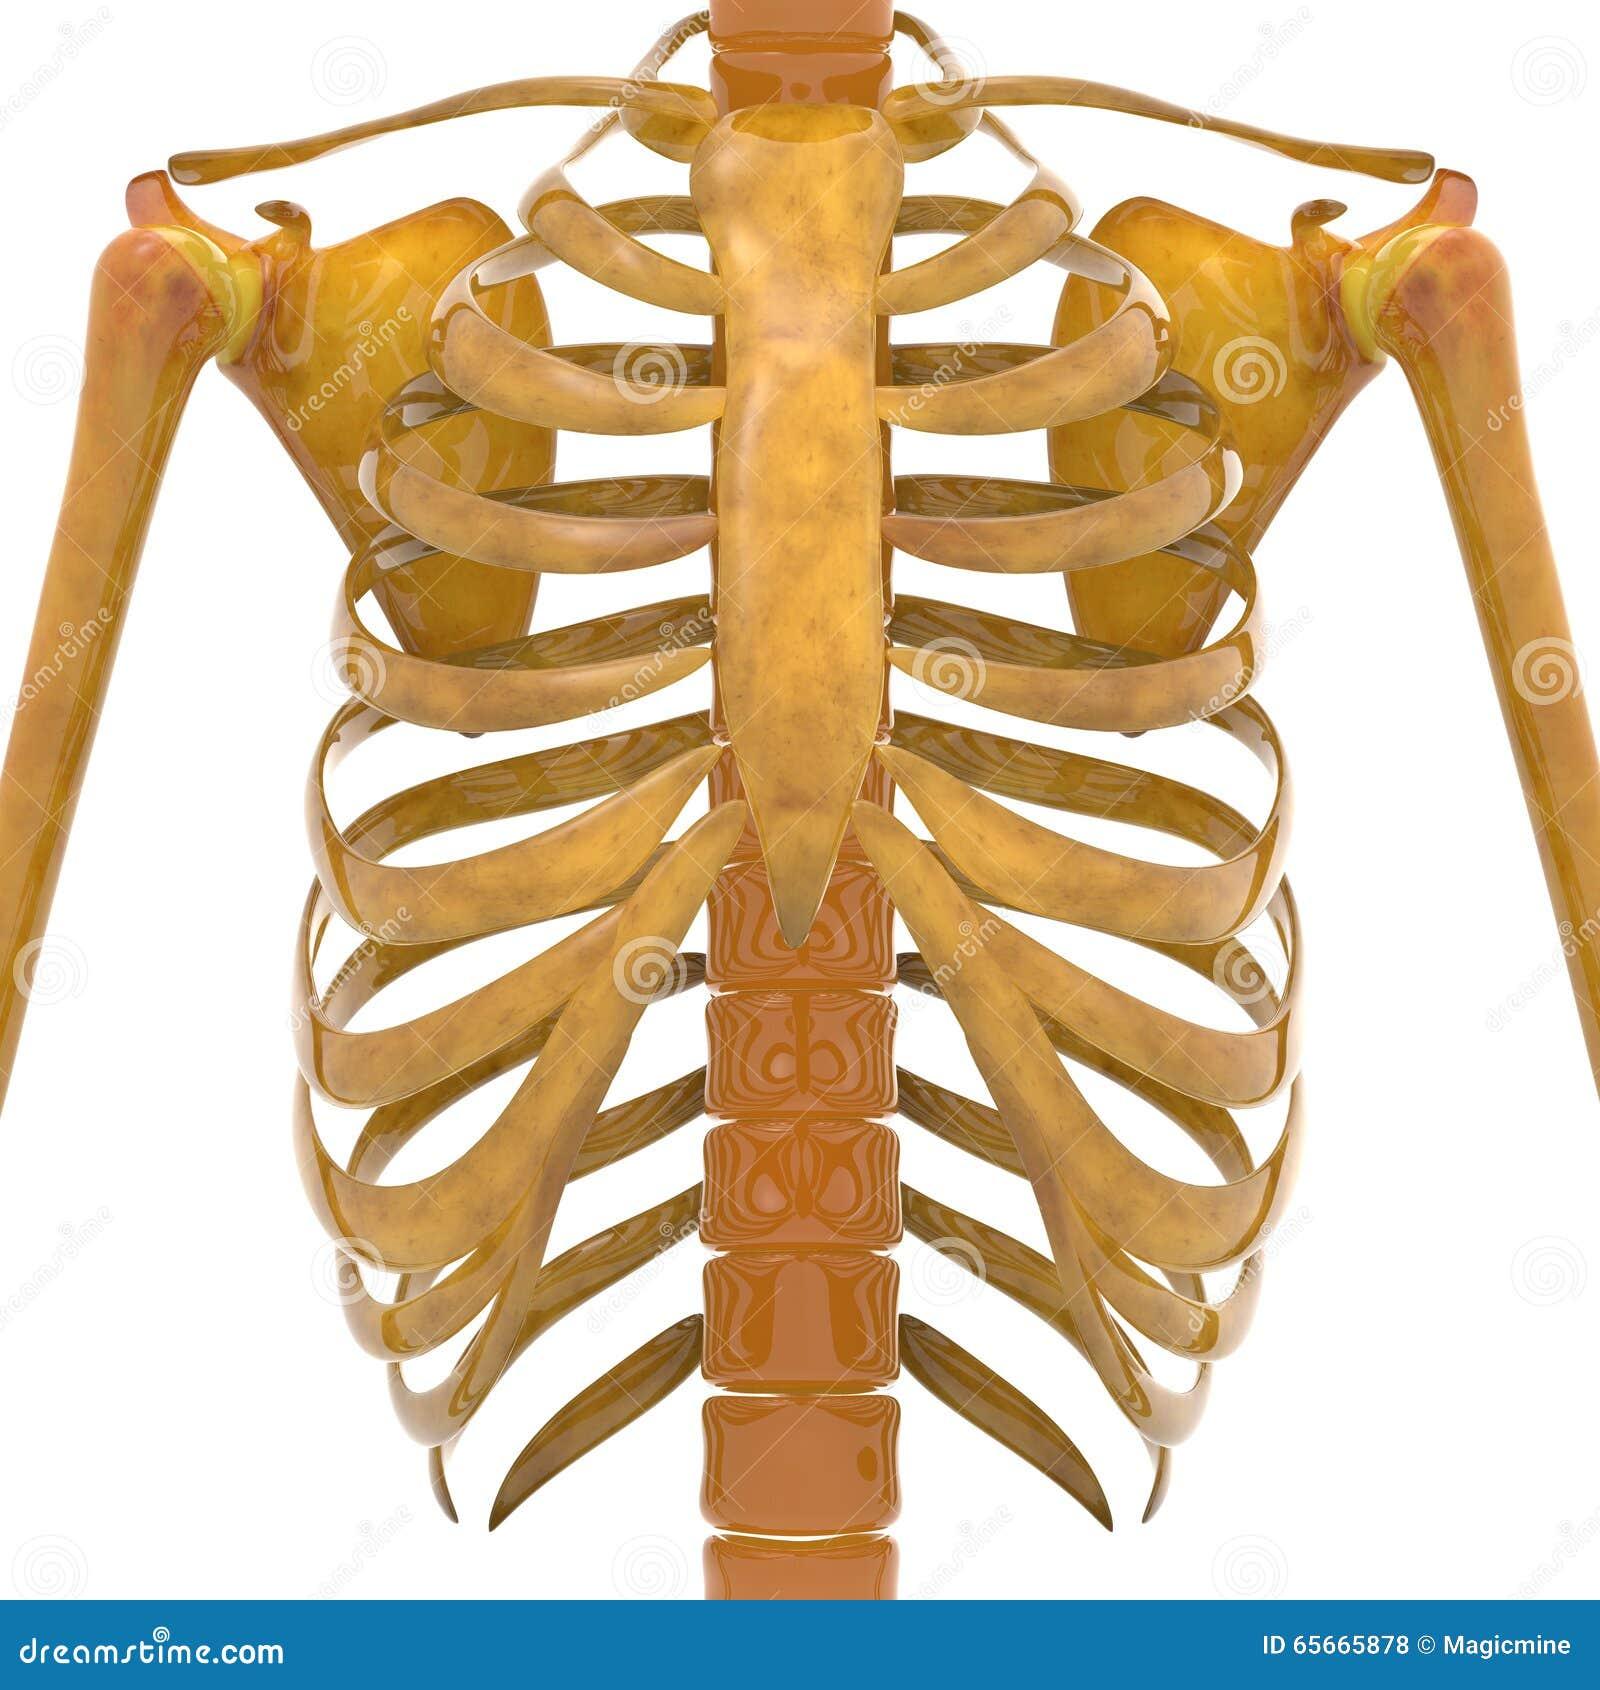 Human Ribs With Scapula Bones Stock Illustration Illustration Of